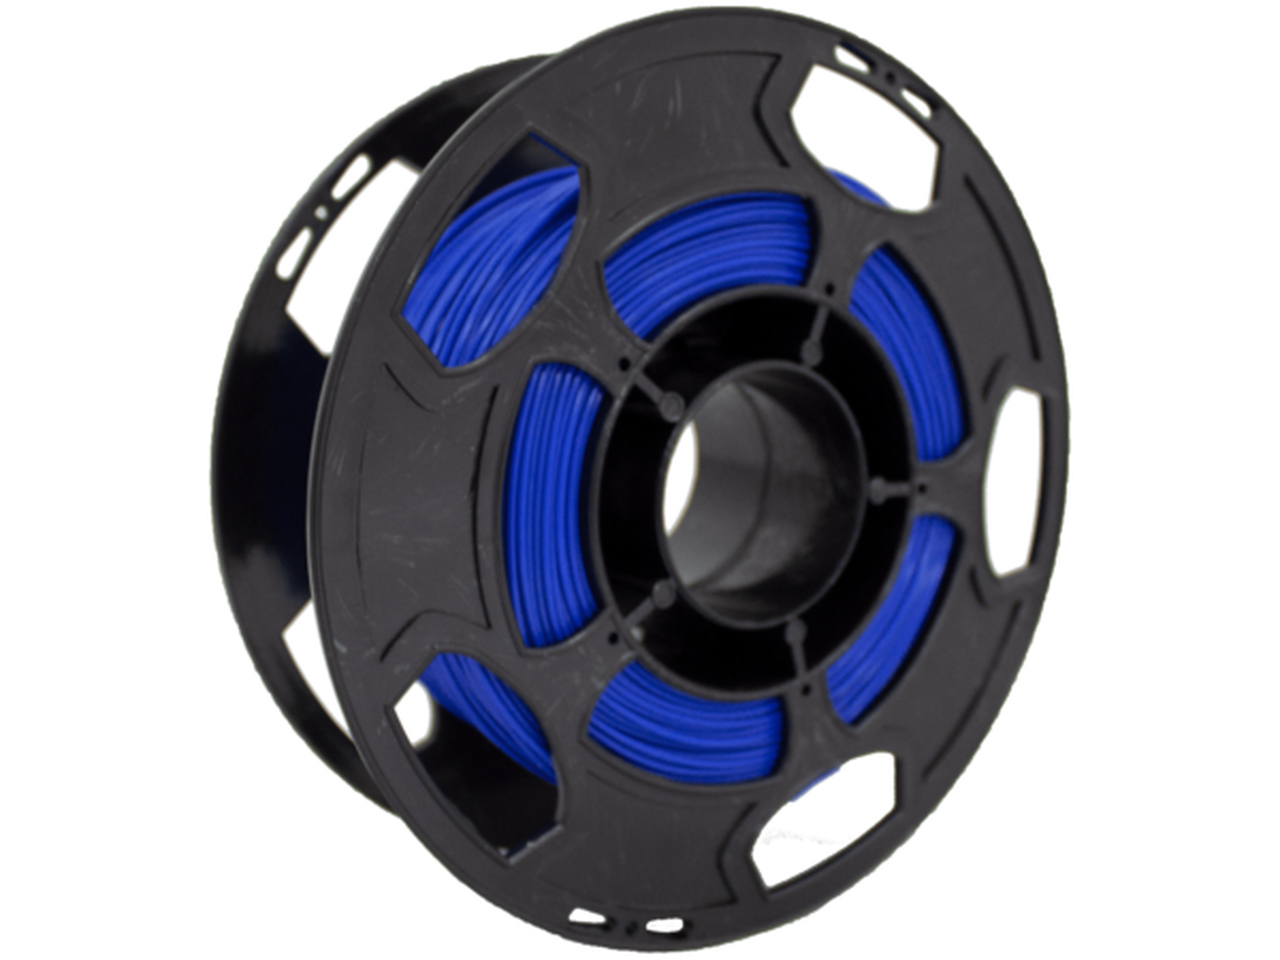 Filamento ABS Premium - Azul - 3D Lab - 1.75mm - 500g